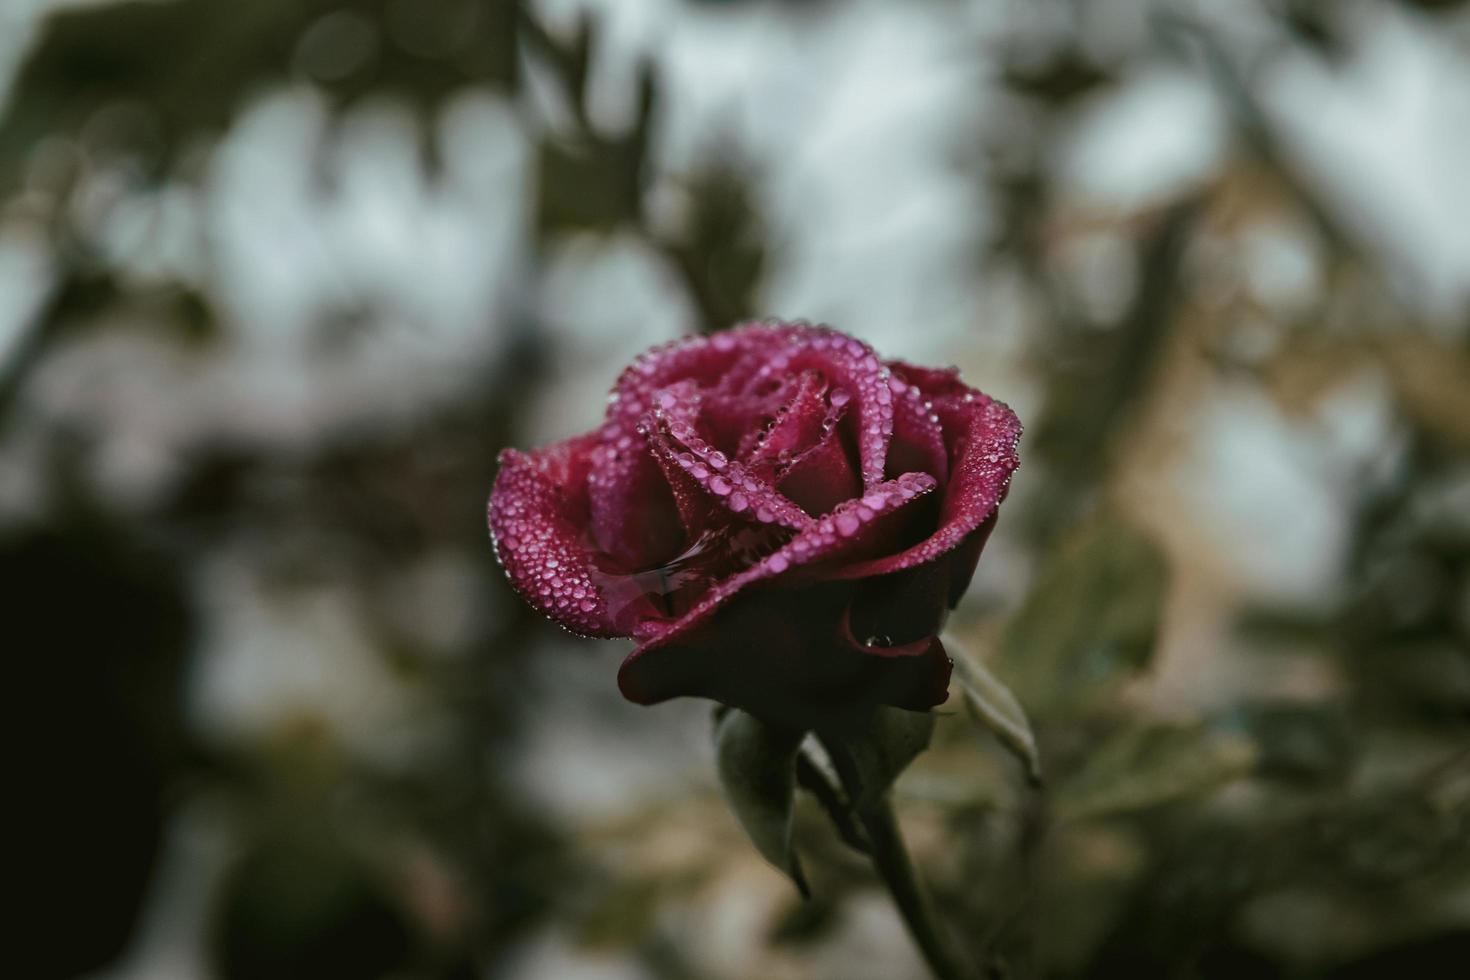 rote Rose mit Tautropfen foto